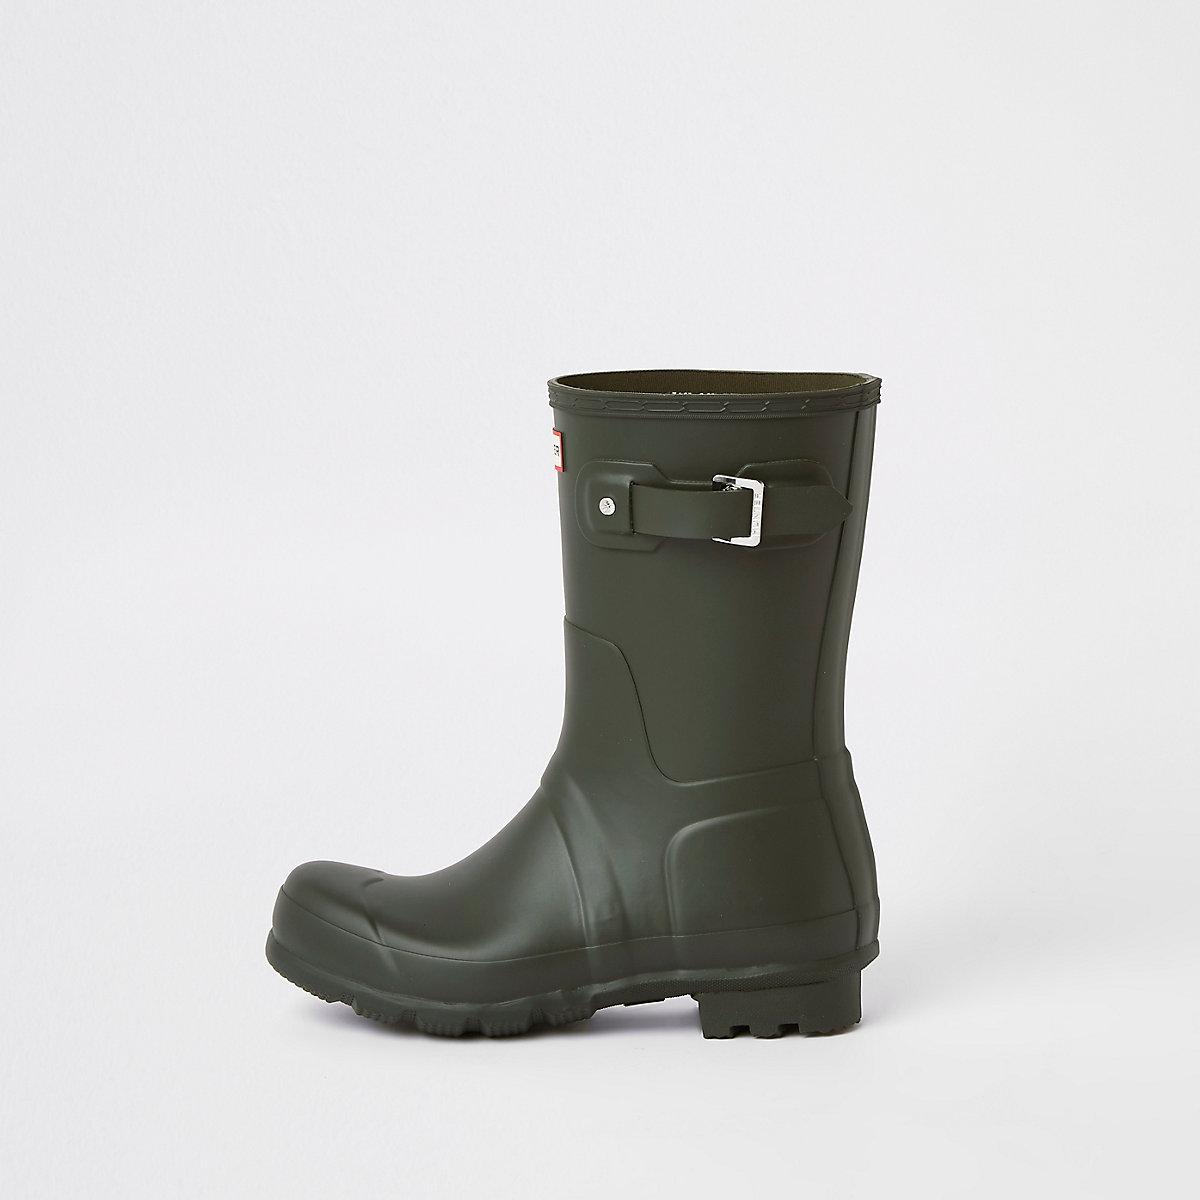 Hunter Original green short wellington boots